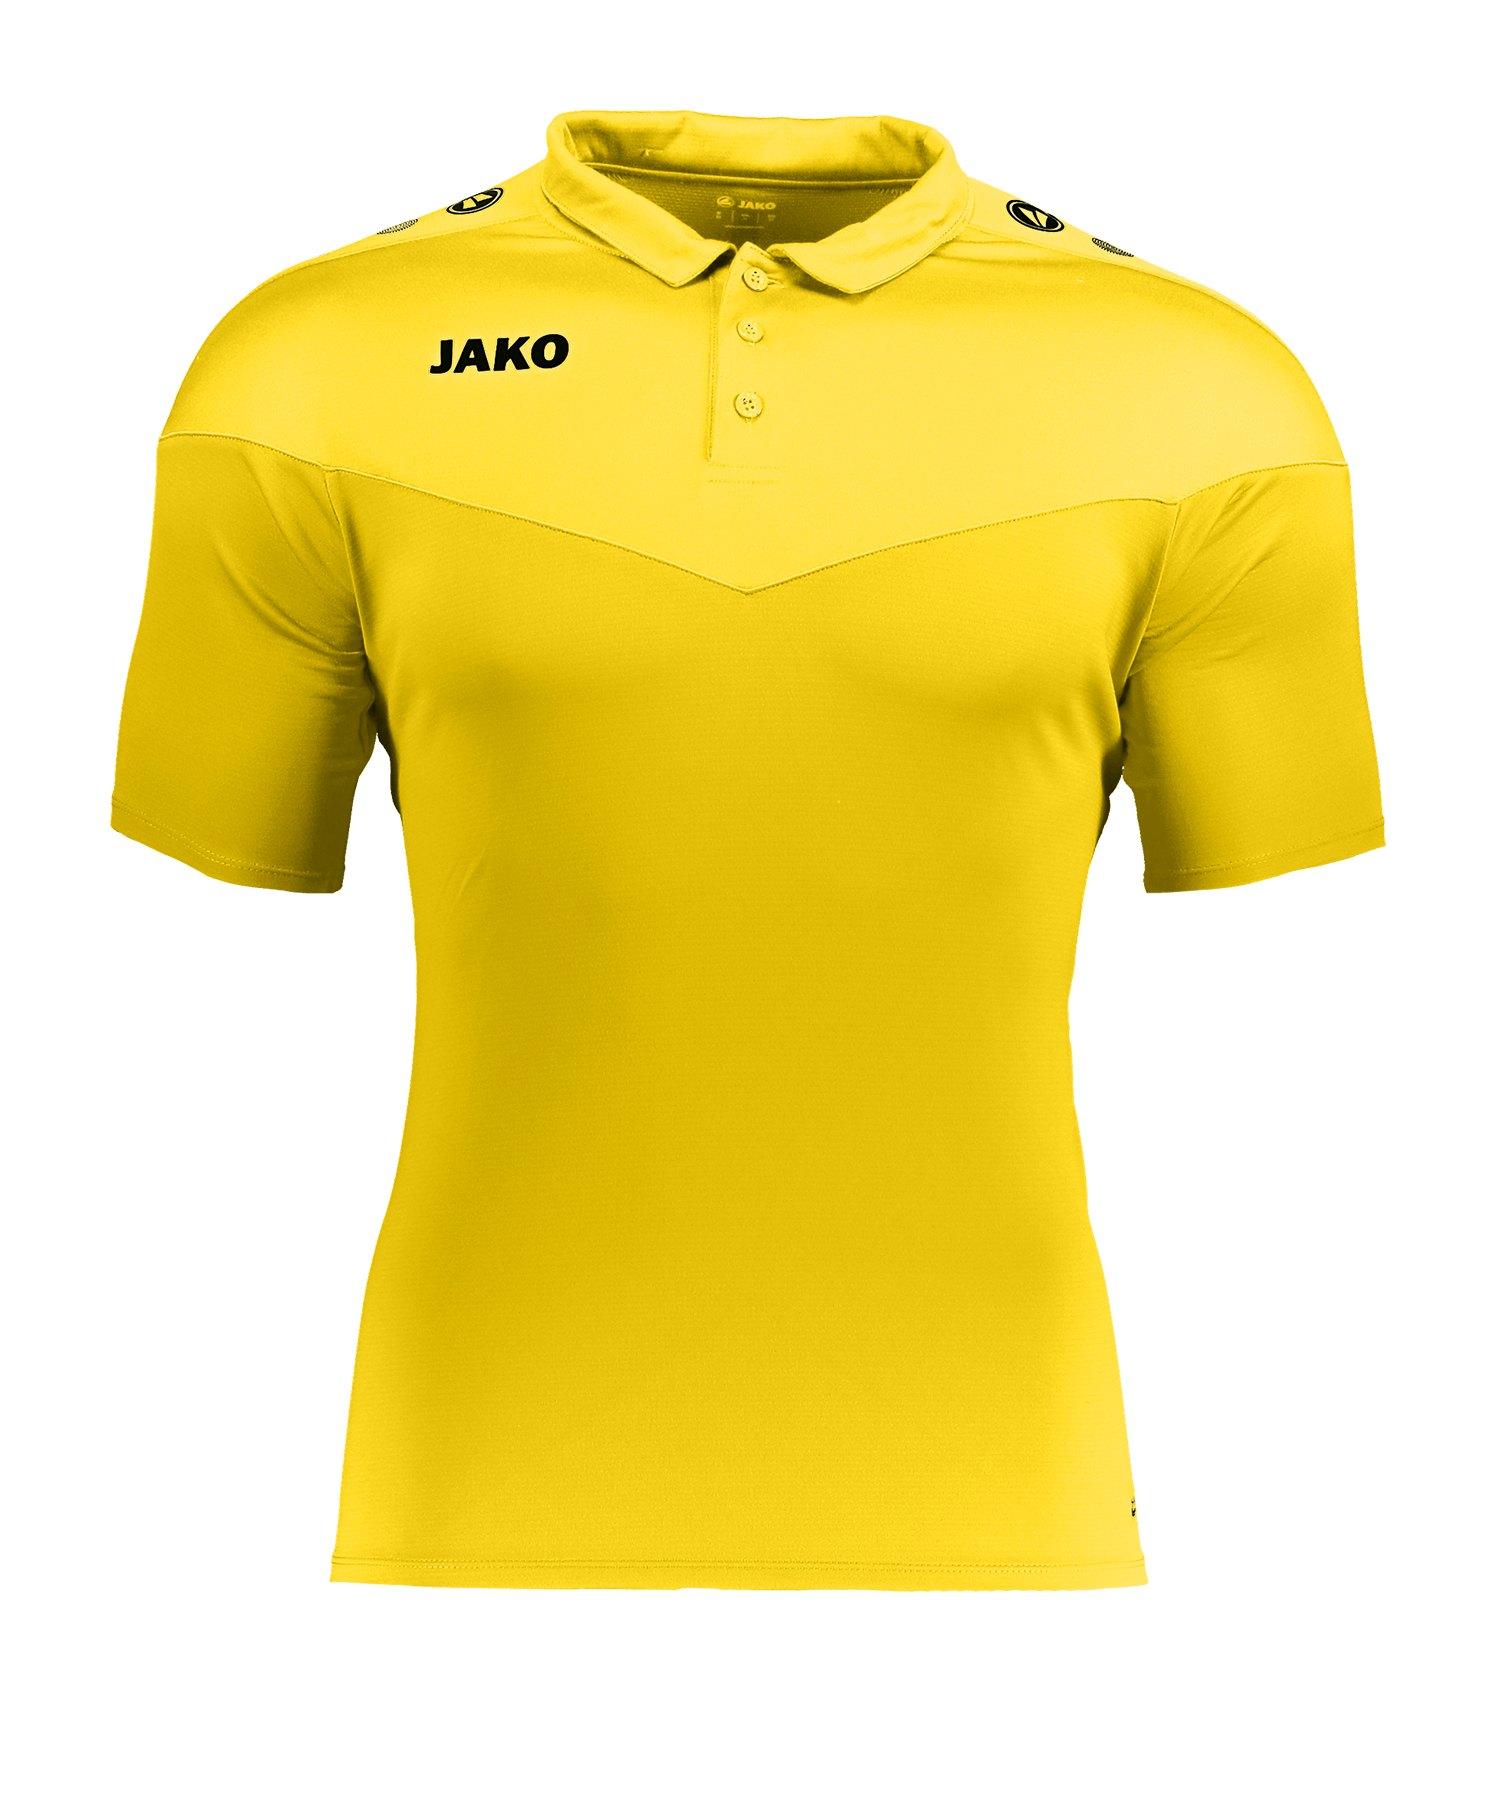 Jako Champ 2.0 Poloshirt Gelb F03 - gelb